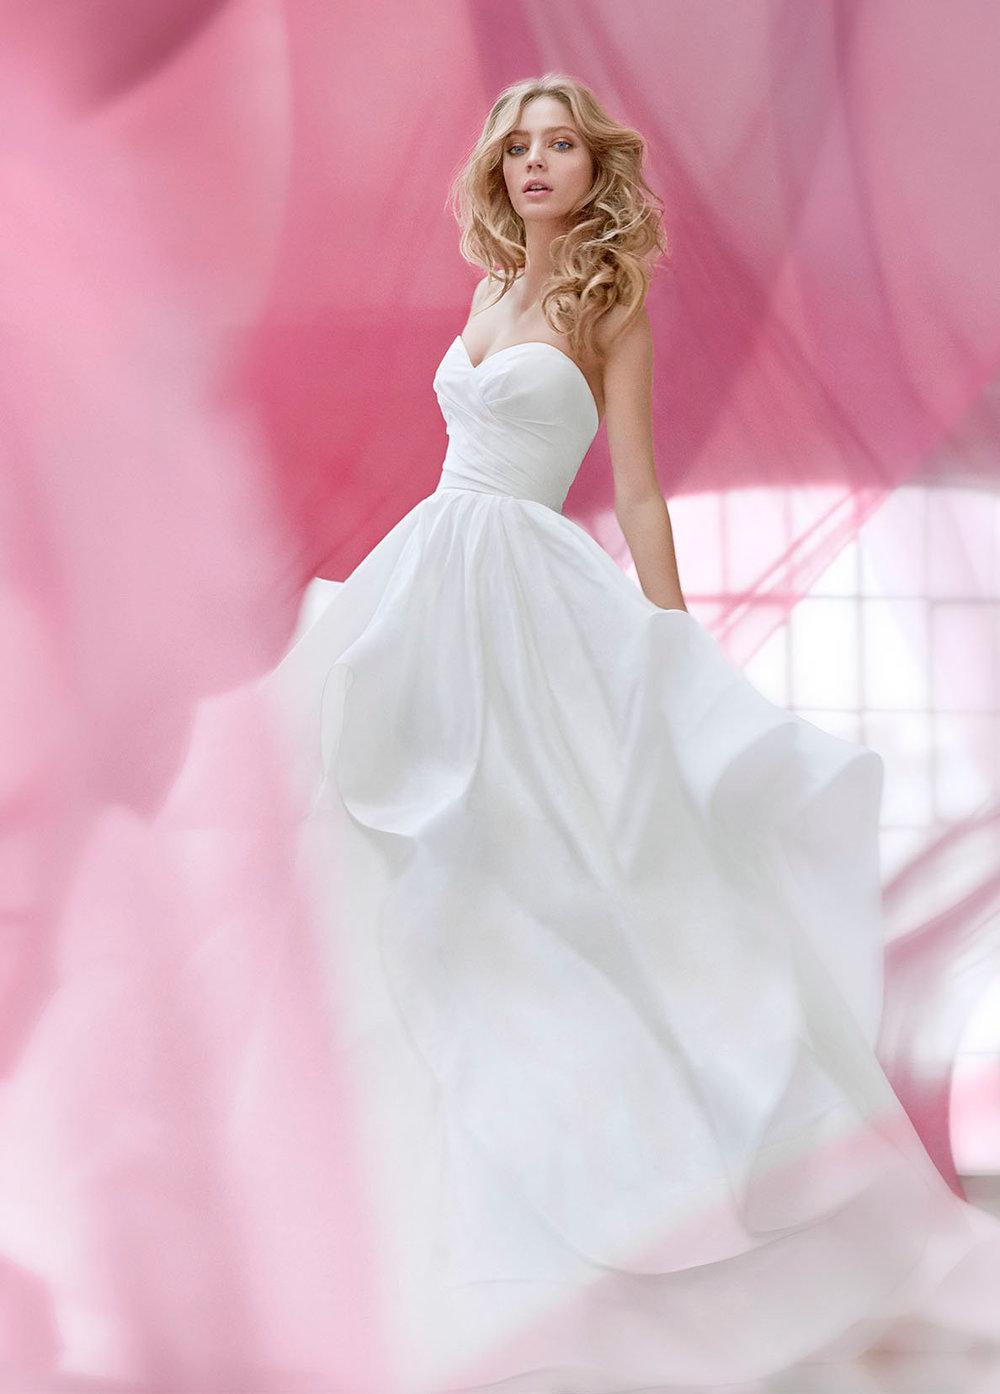 blush-hayley-paige-bridal-draped-taffeta-ball-strapless-sweetheart-crossover-bodice-taffeta-horsehair-1602_lg.jpg